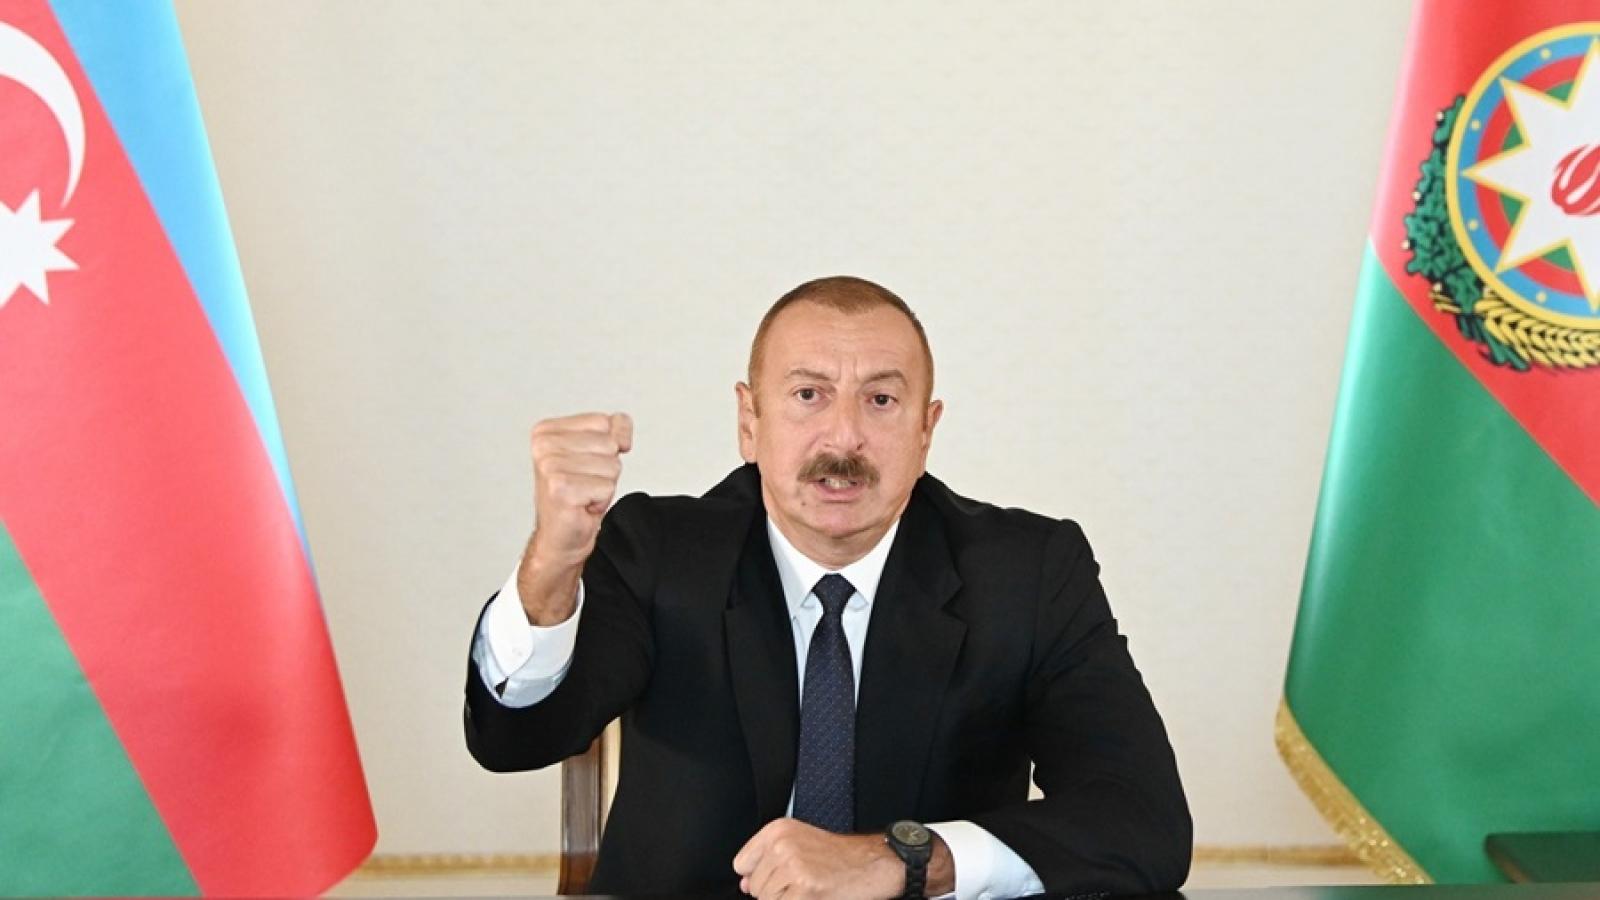 Azerbaijan cứng rắn trong quan điểm về Nagorno-Karabakh, thỏa thuận ngừng bắn mong manh